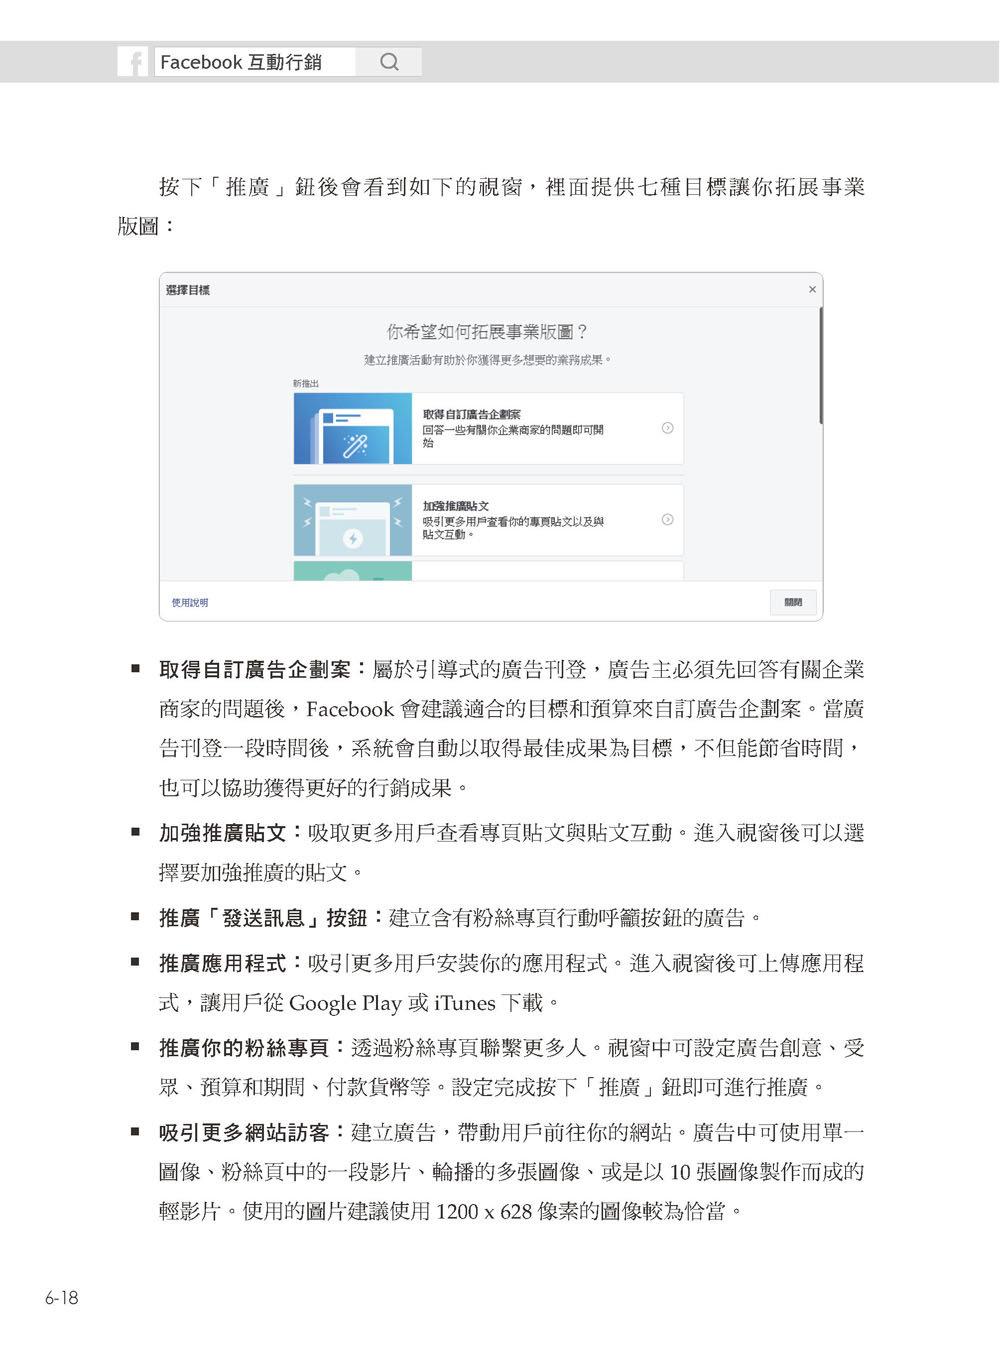 Facebook 互動行銷:社群口碑經營新思路+廣告投放如何有成效,想做好臉書行銷,操作心法就在這!-preview-48